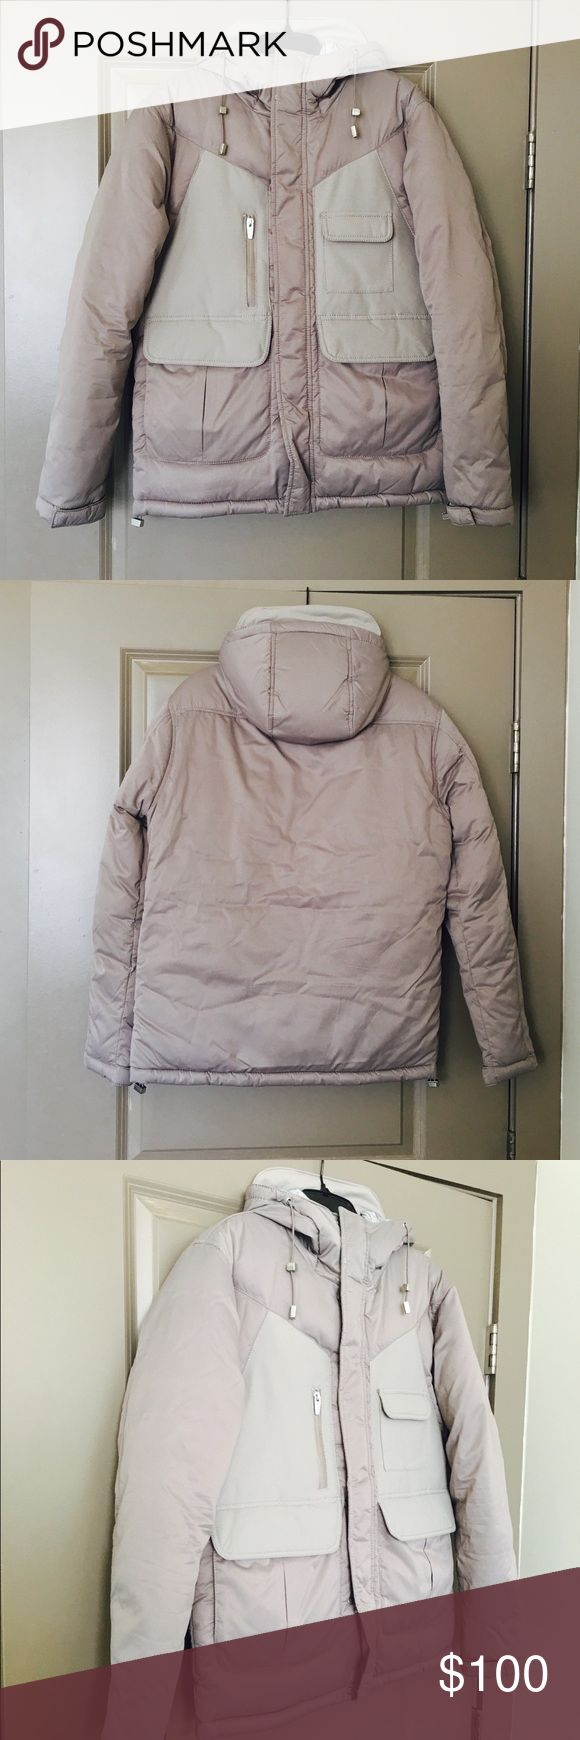 🎉SALE🎉Zara Winter Coat Zara men's size M thick winter coat. NWT. The color is grayish/tan. Zara Jackets & Coats